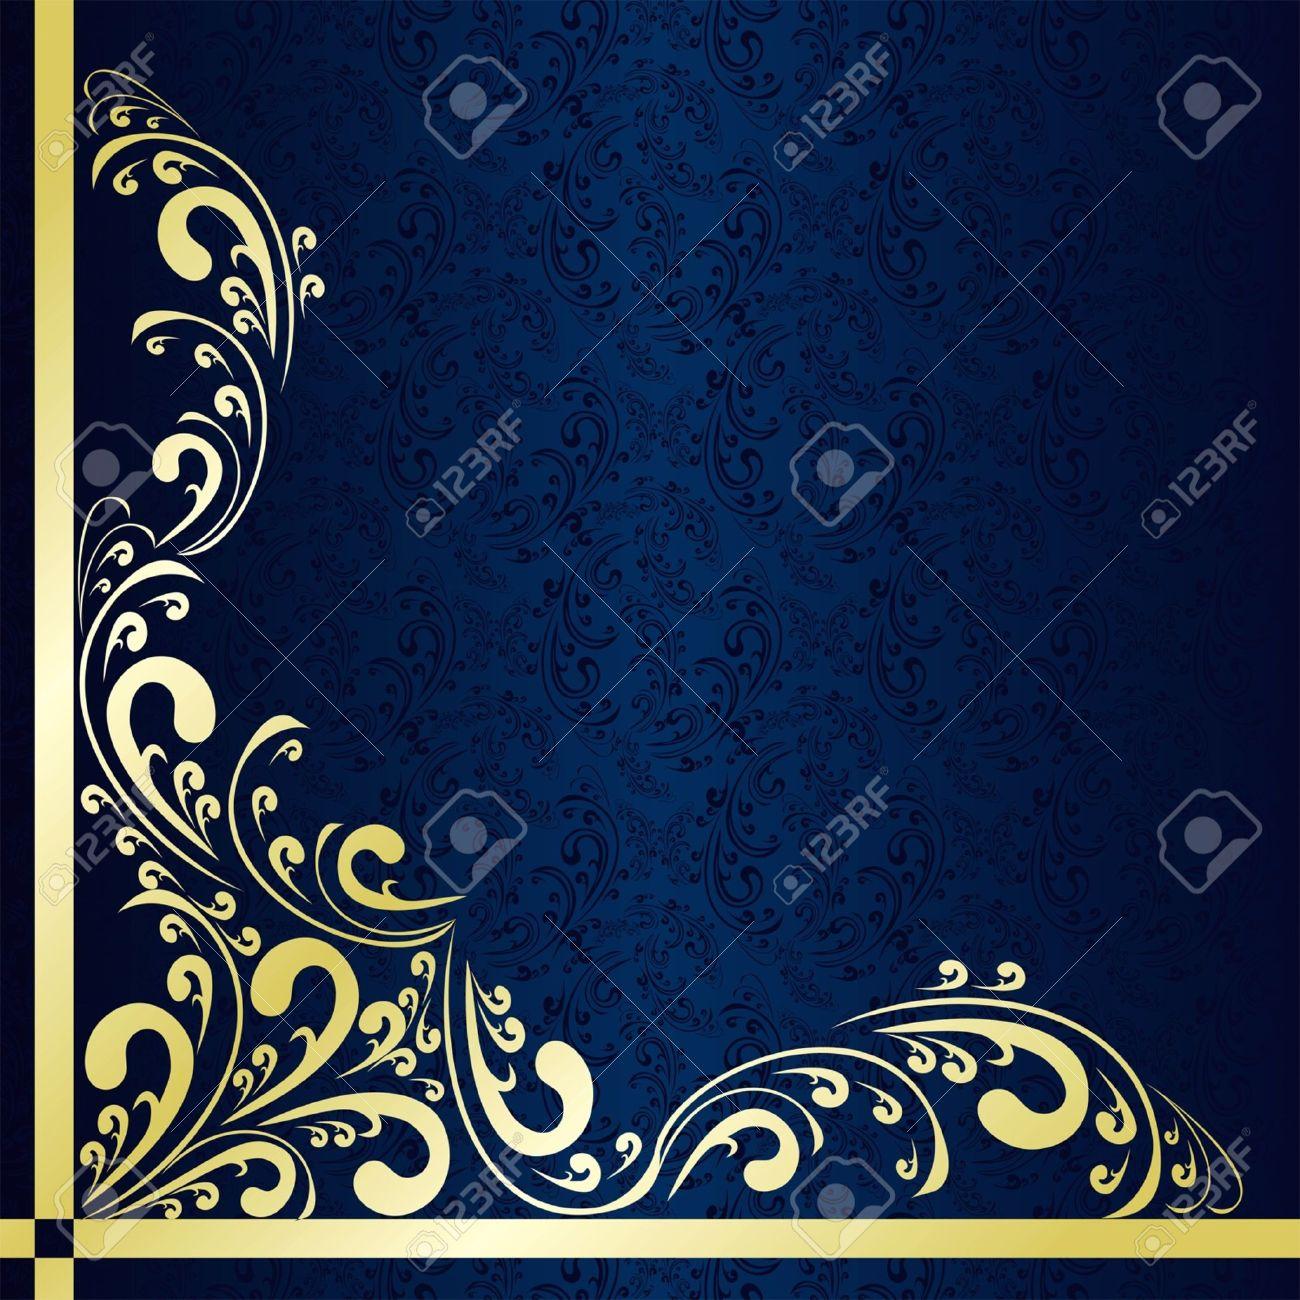 Luxury dark blue Background decorated a gold border - 17323841